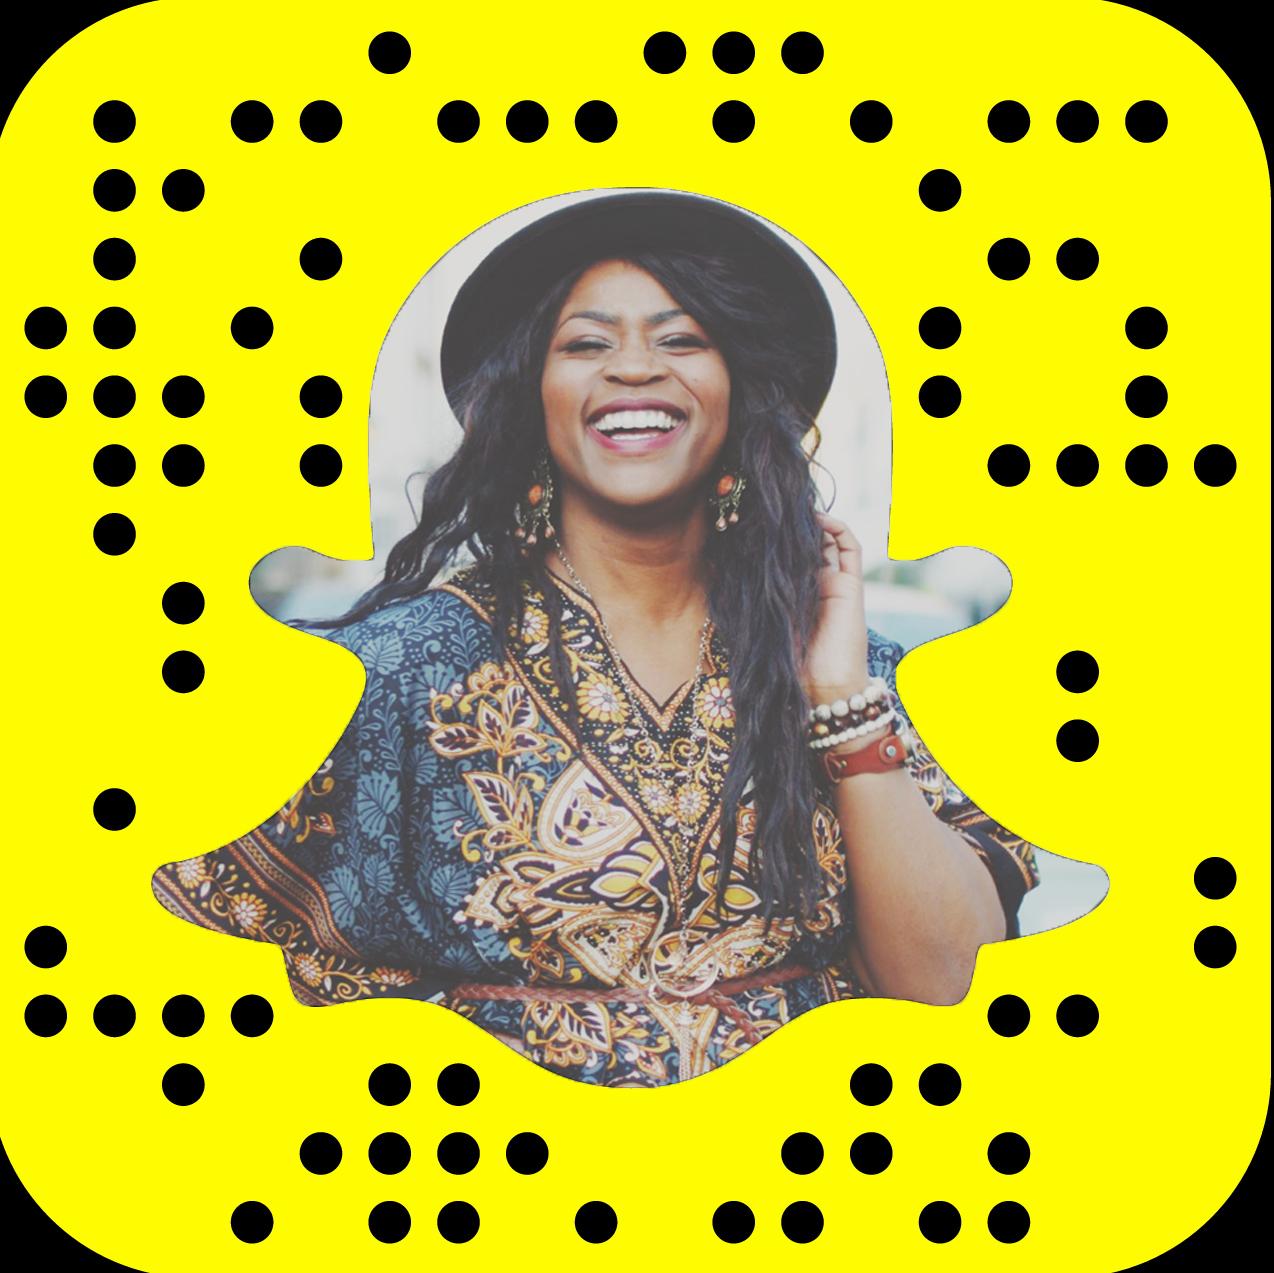 Snapchat | TheBlogAbroad.com